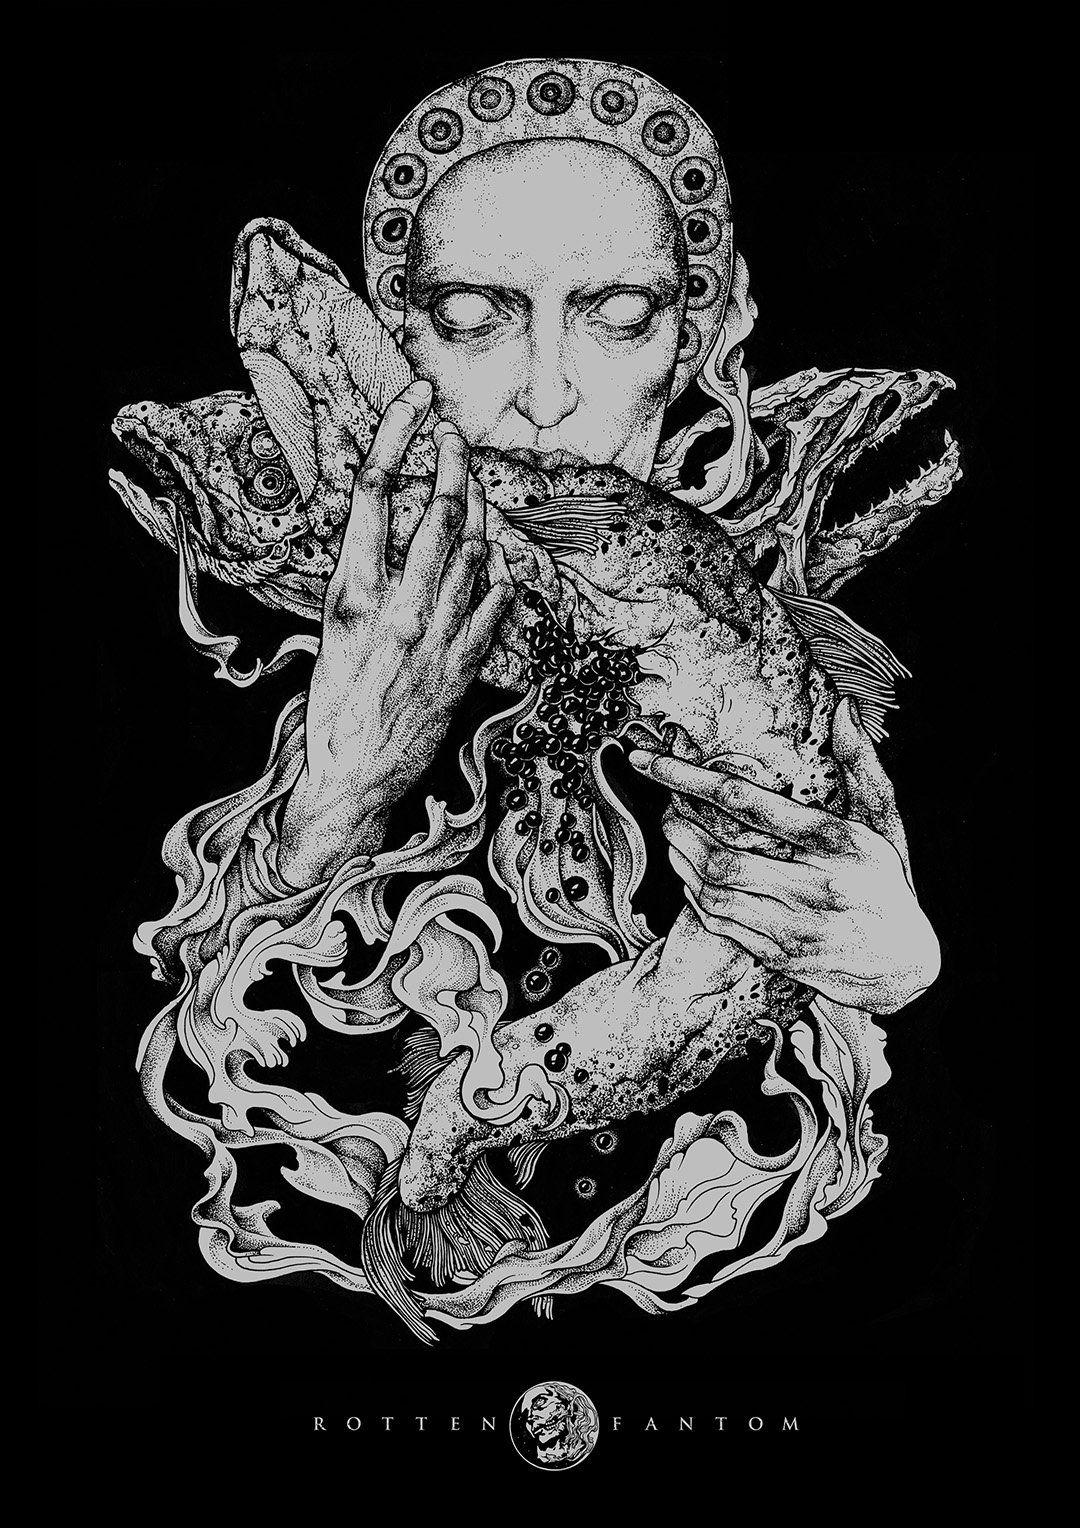 "Jung Katz en Twitter: ""Interview with Pointillism Artists, Rotten Fantom on Jung Katz https://t.co/IguP1i5pTy https://t.co/DRXqXCGL3h"""